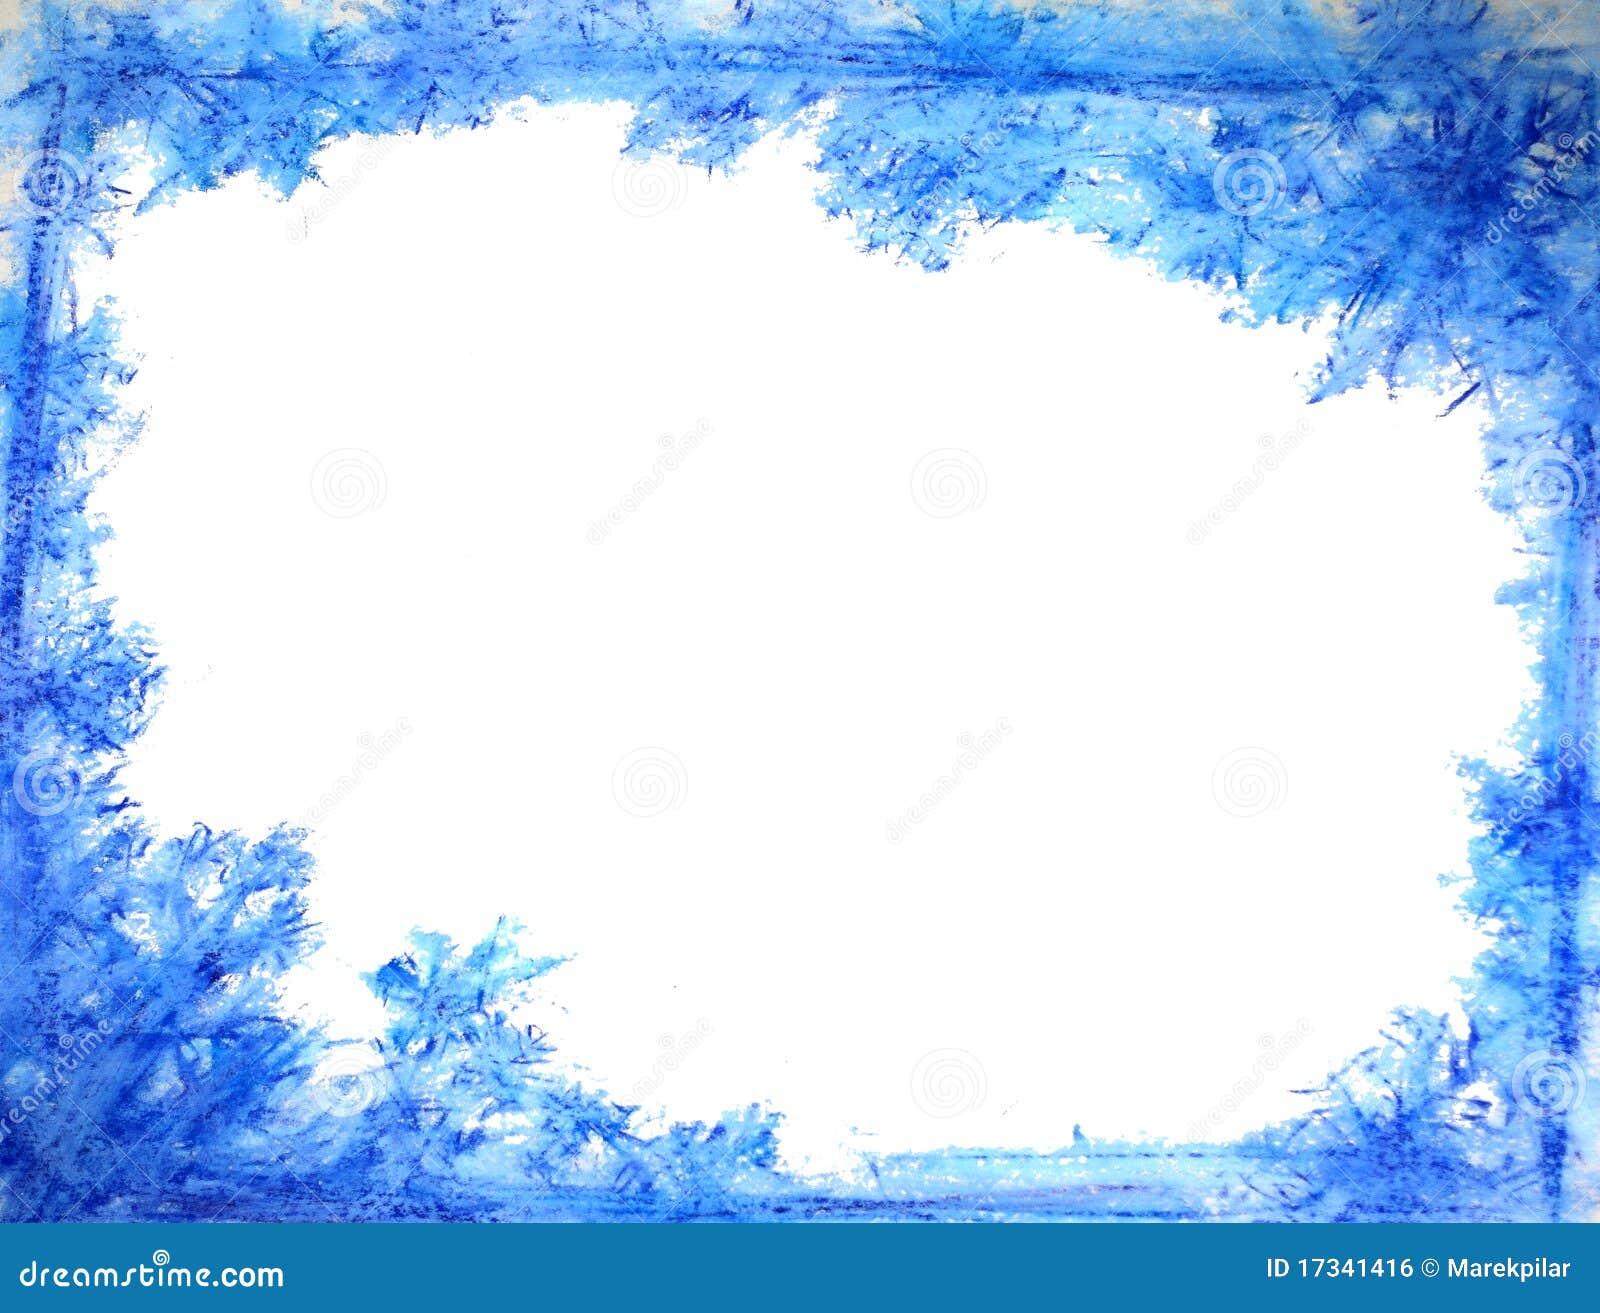 Winter Frame Royalty Free Stock Image - Image: 17341416